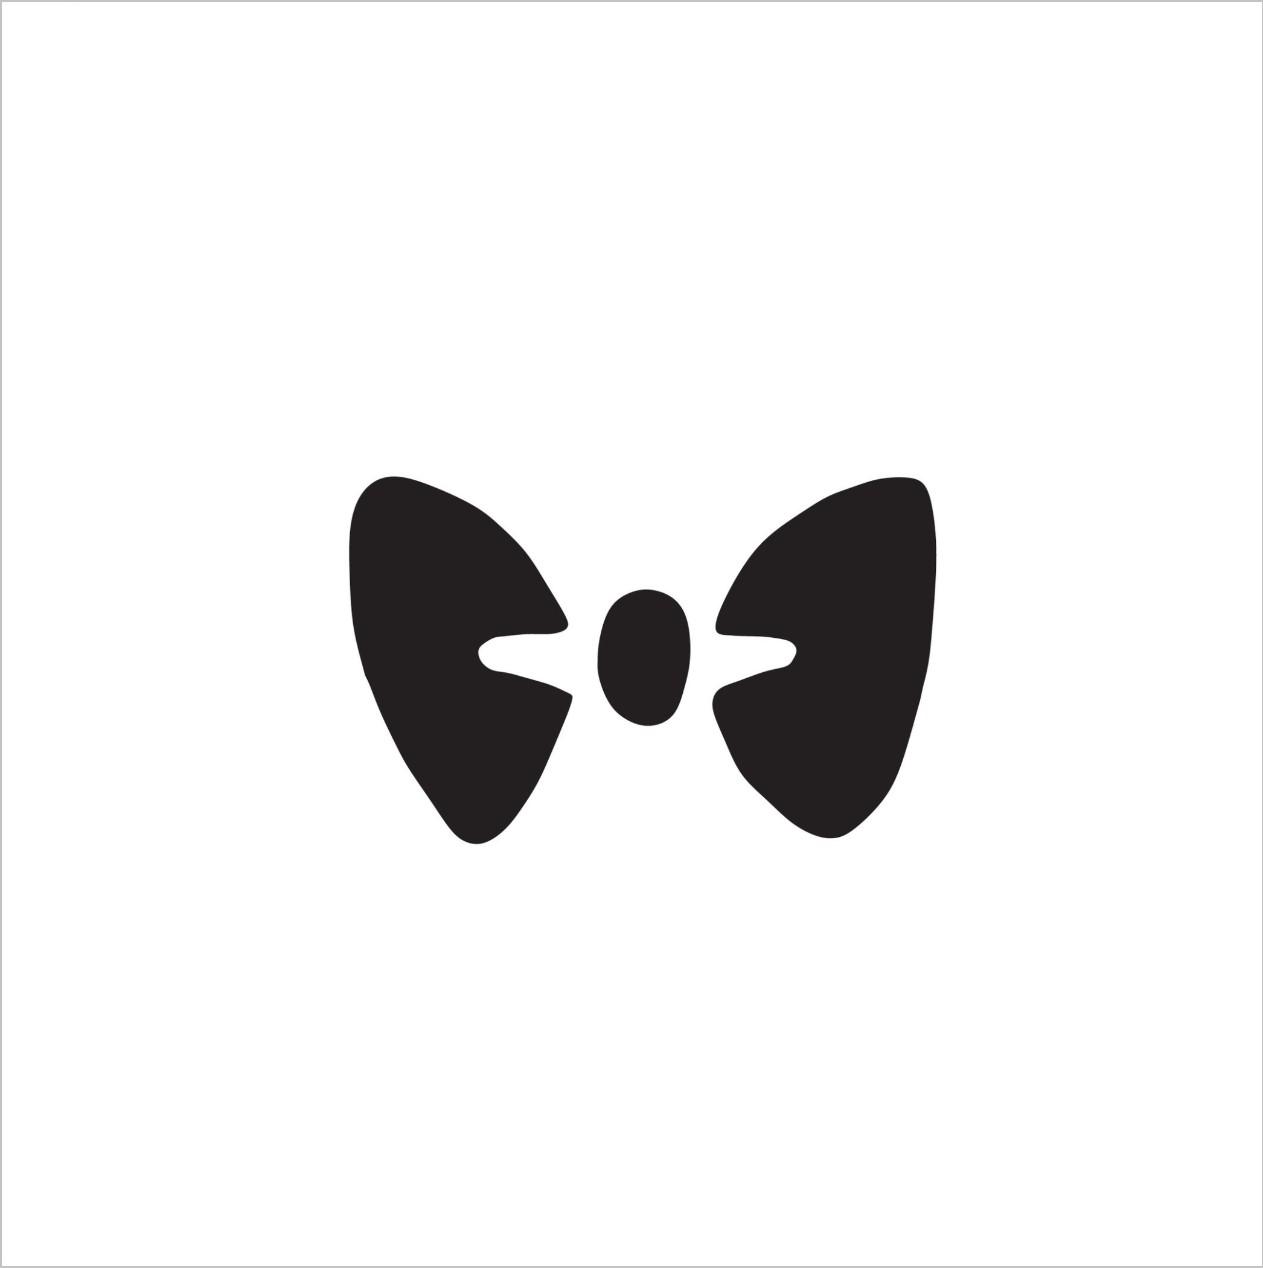 Bow Tie Professional Stencil Insert (small)